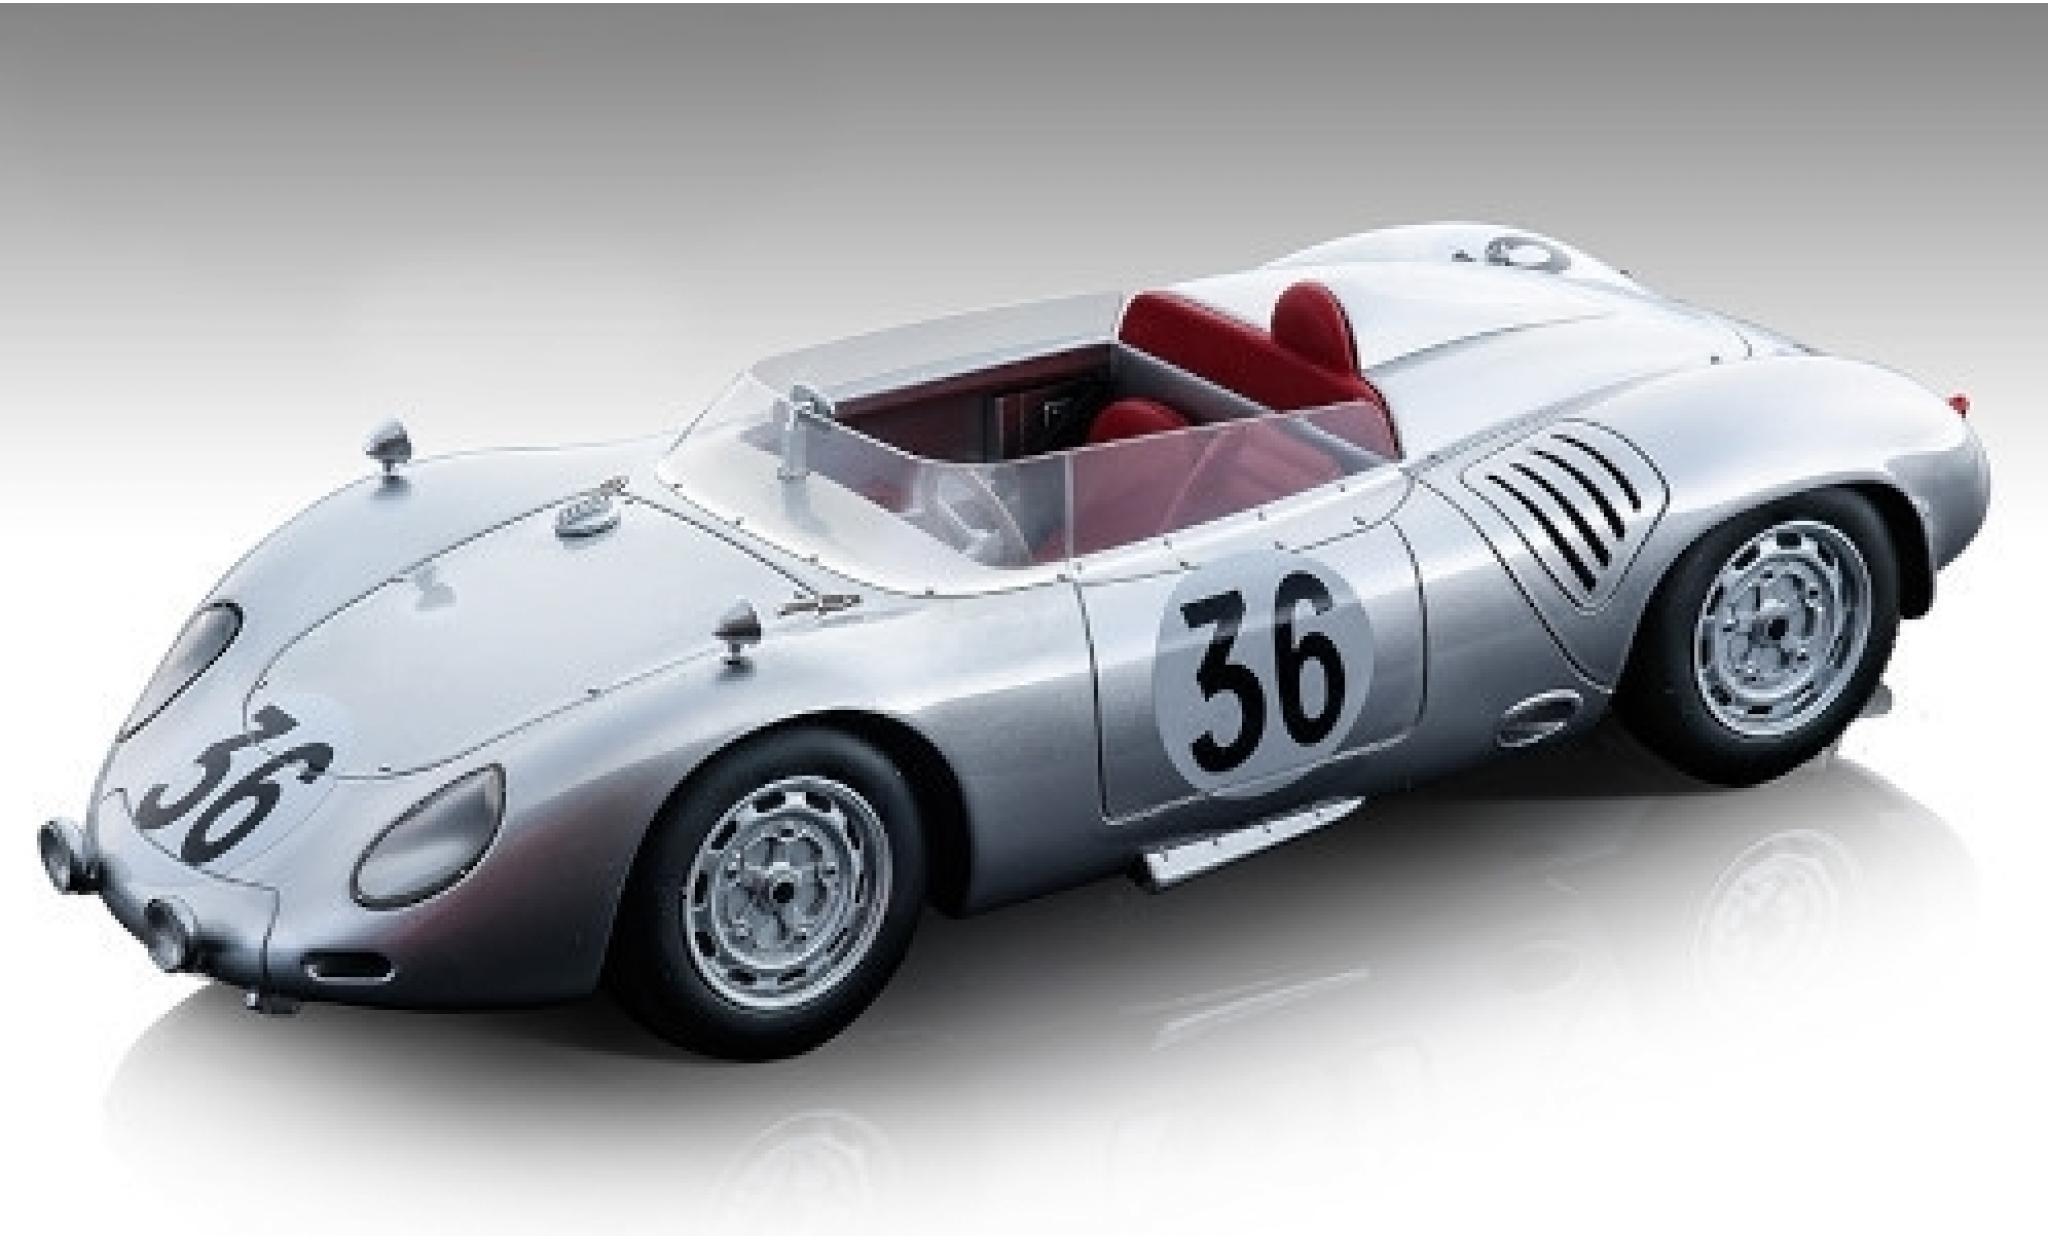 Porsche 718 1/18 Tecnomodel RSK No.36 Baron Carel Godin de Beaufort 24h Le Mans 1959 C.Godin de Beaufort/C.Heins